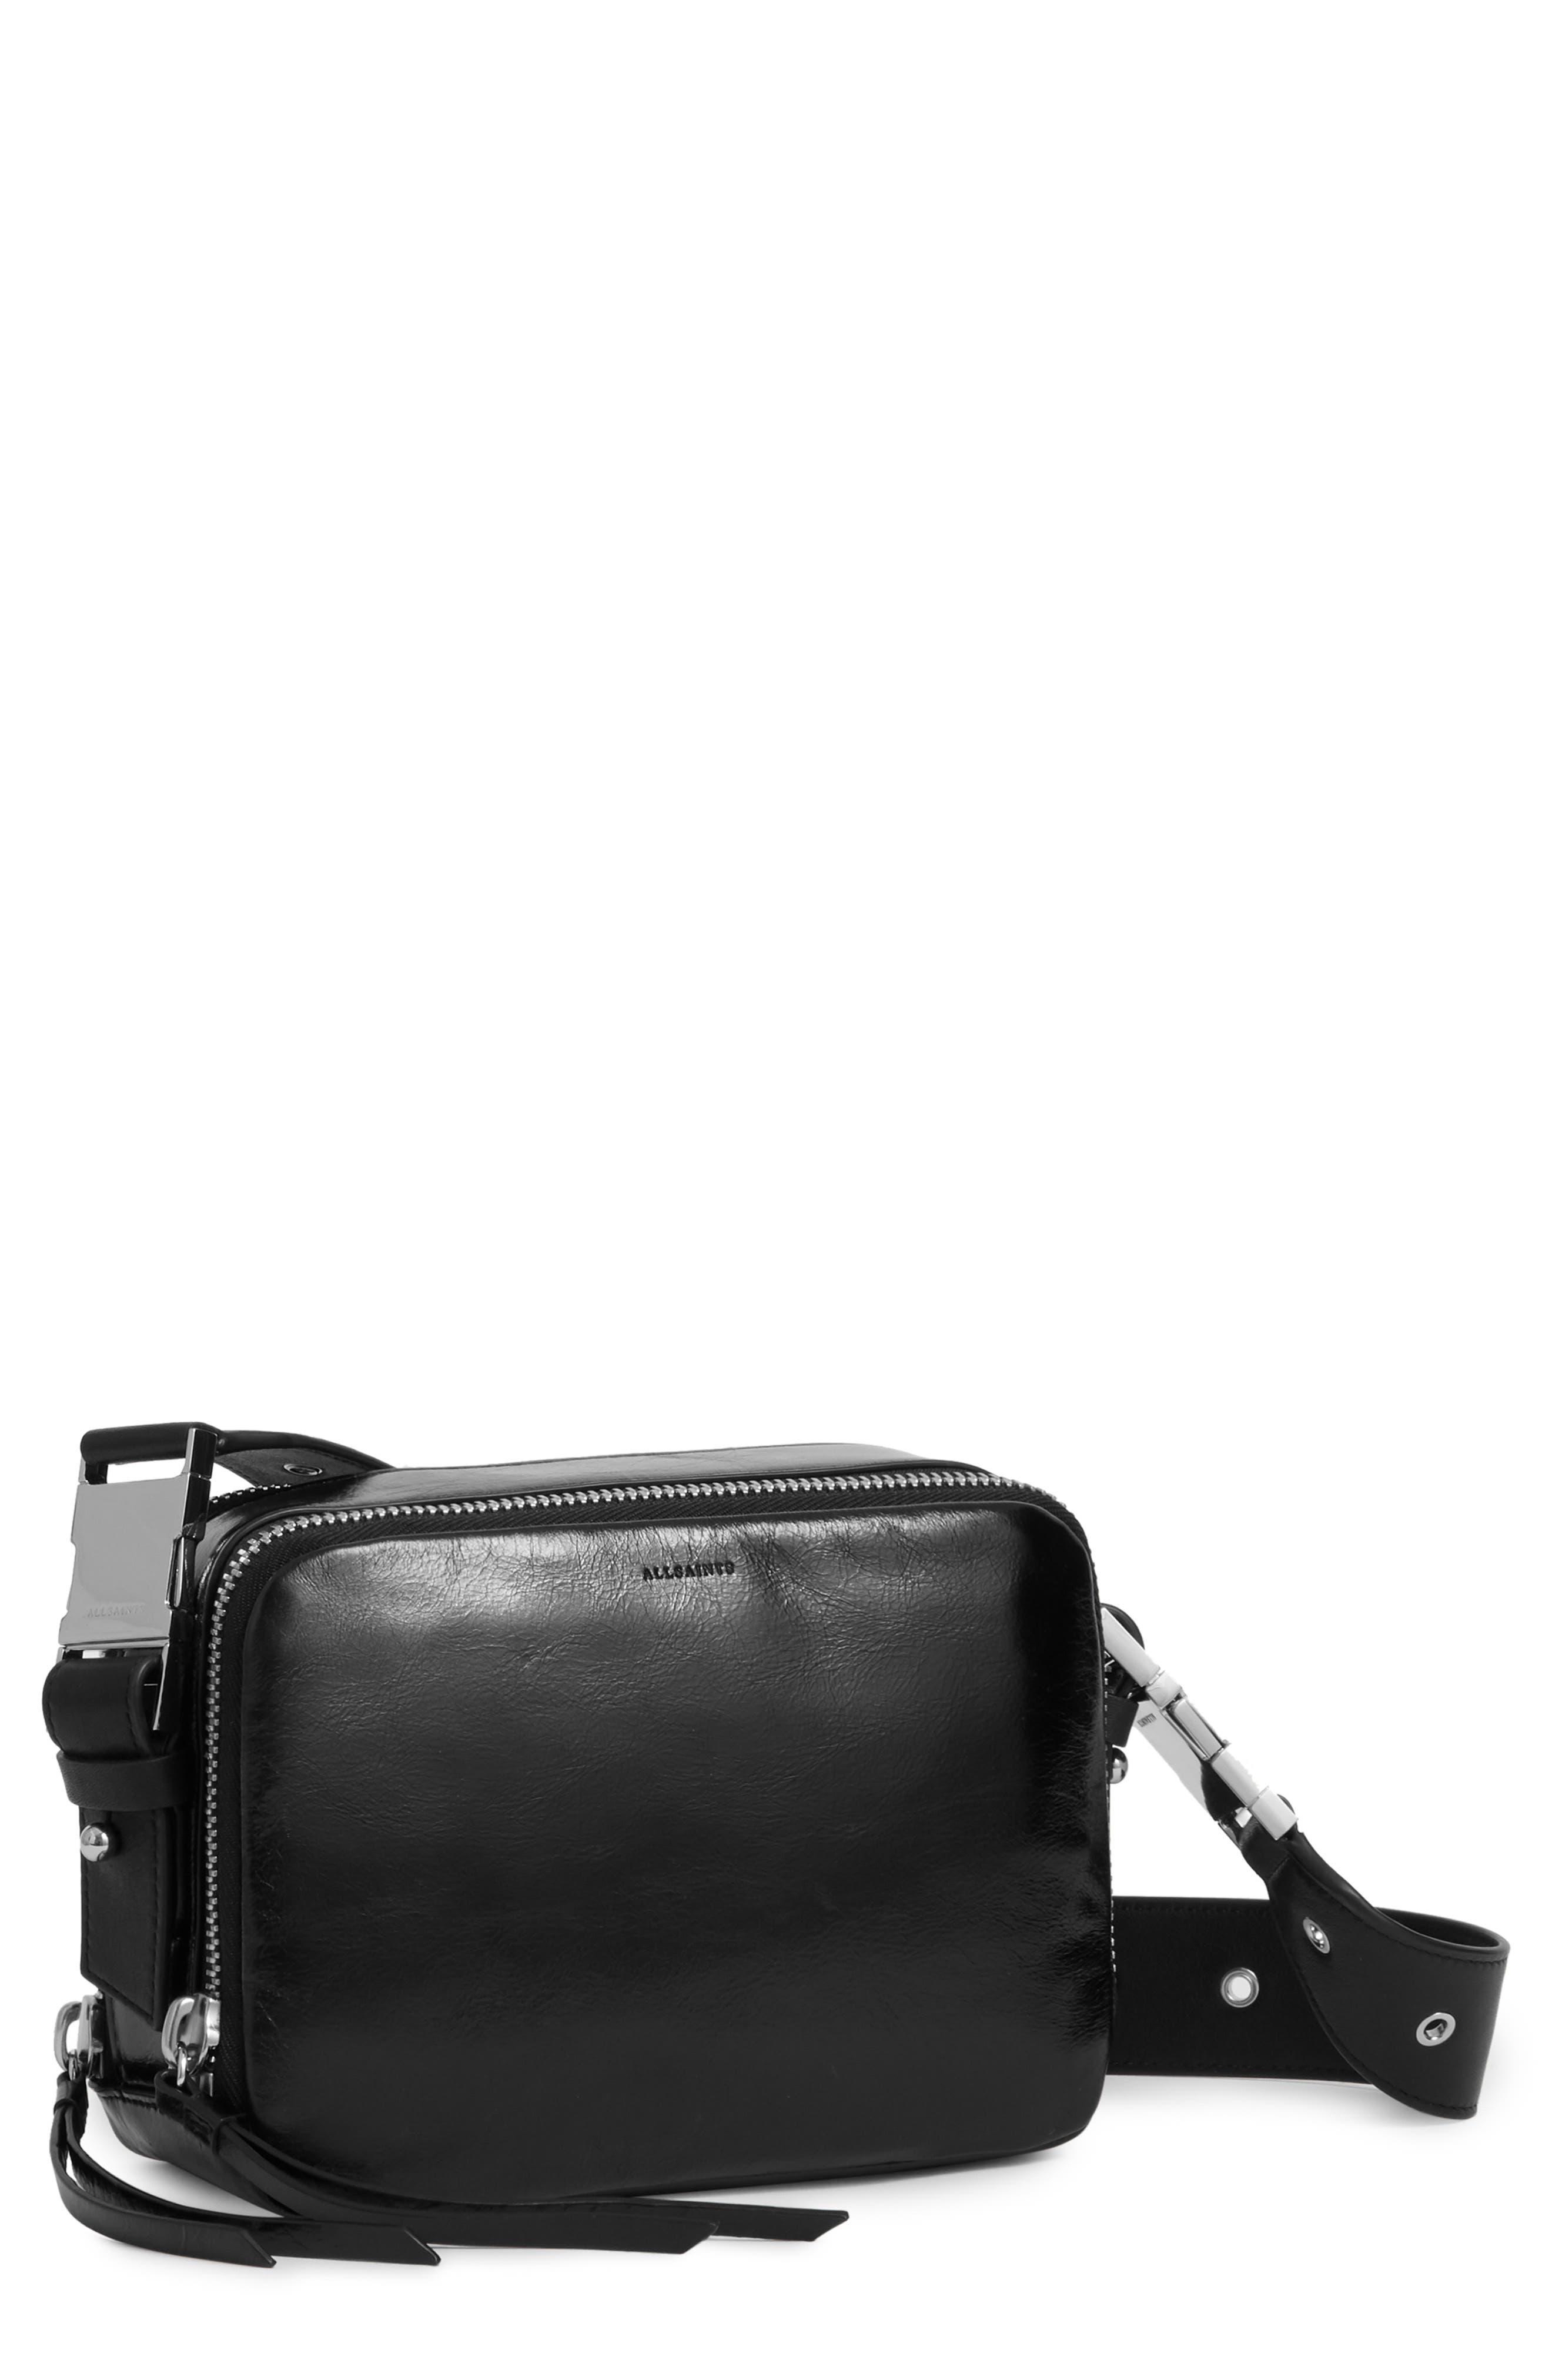 ALLSAINTS Leather Belt Bag, Main, color, 001